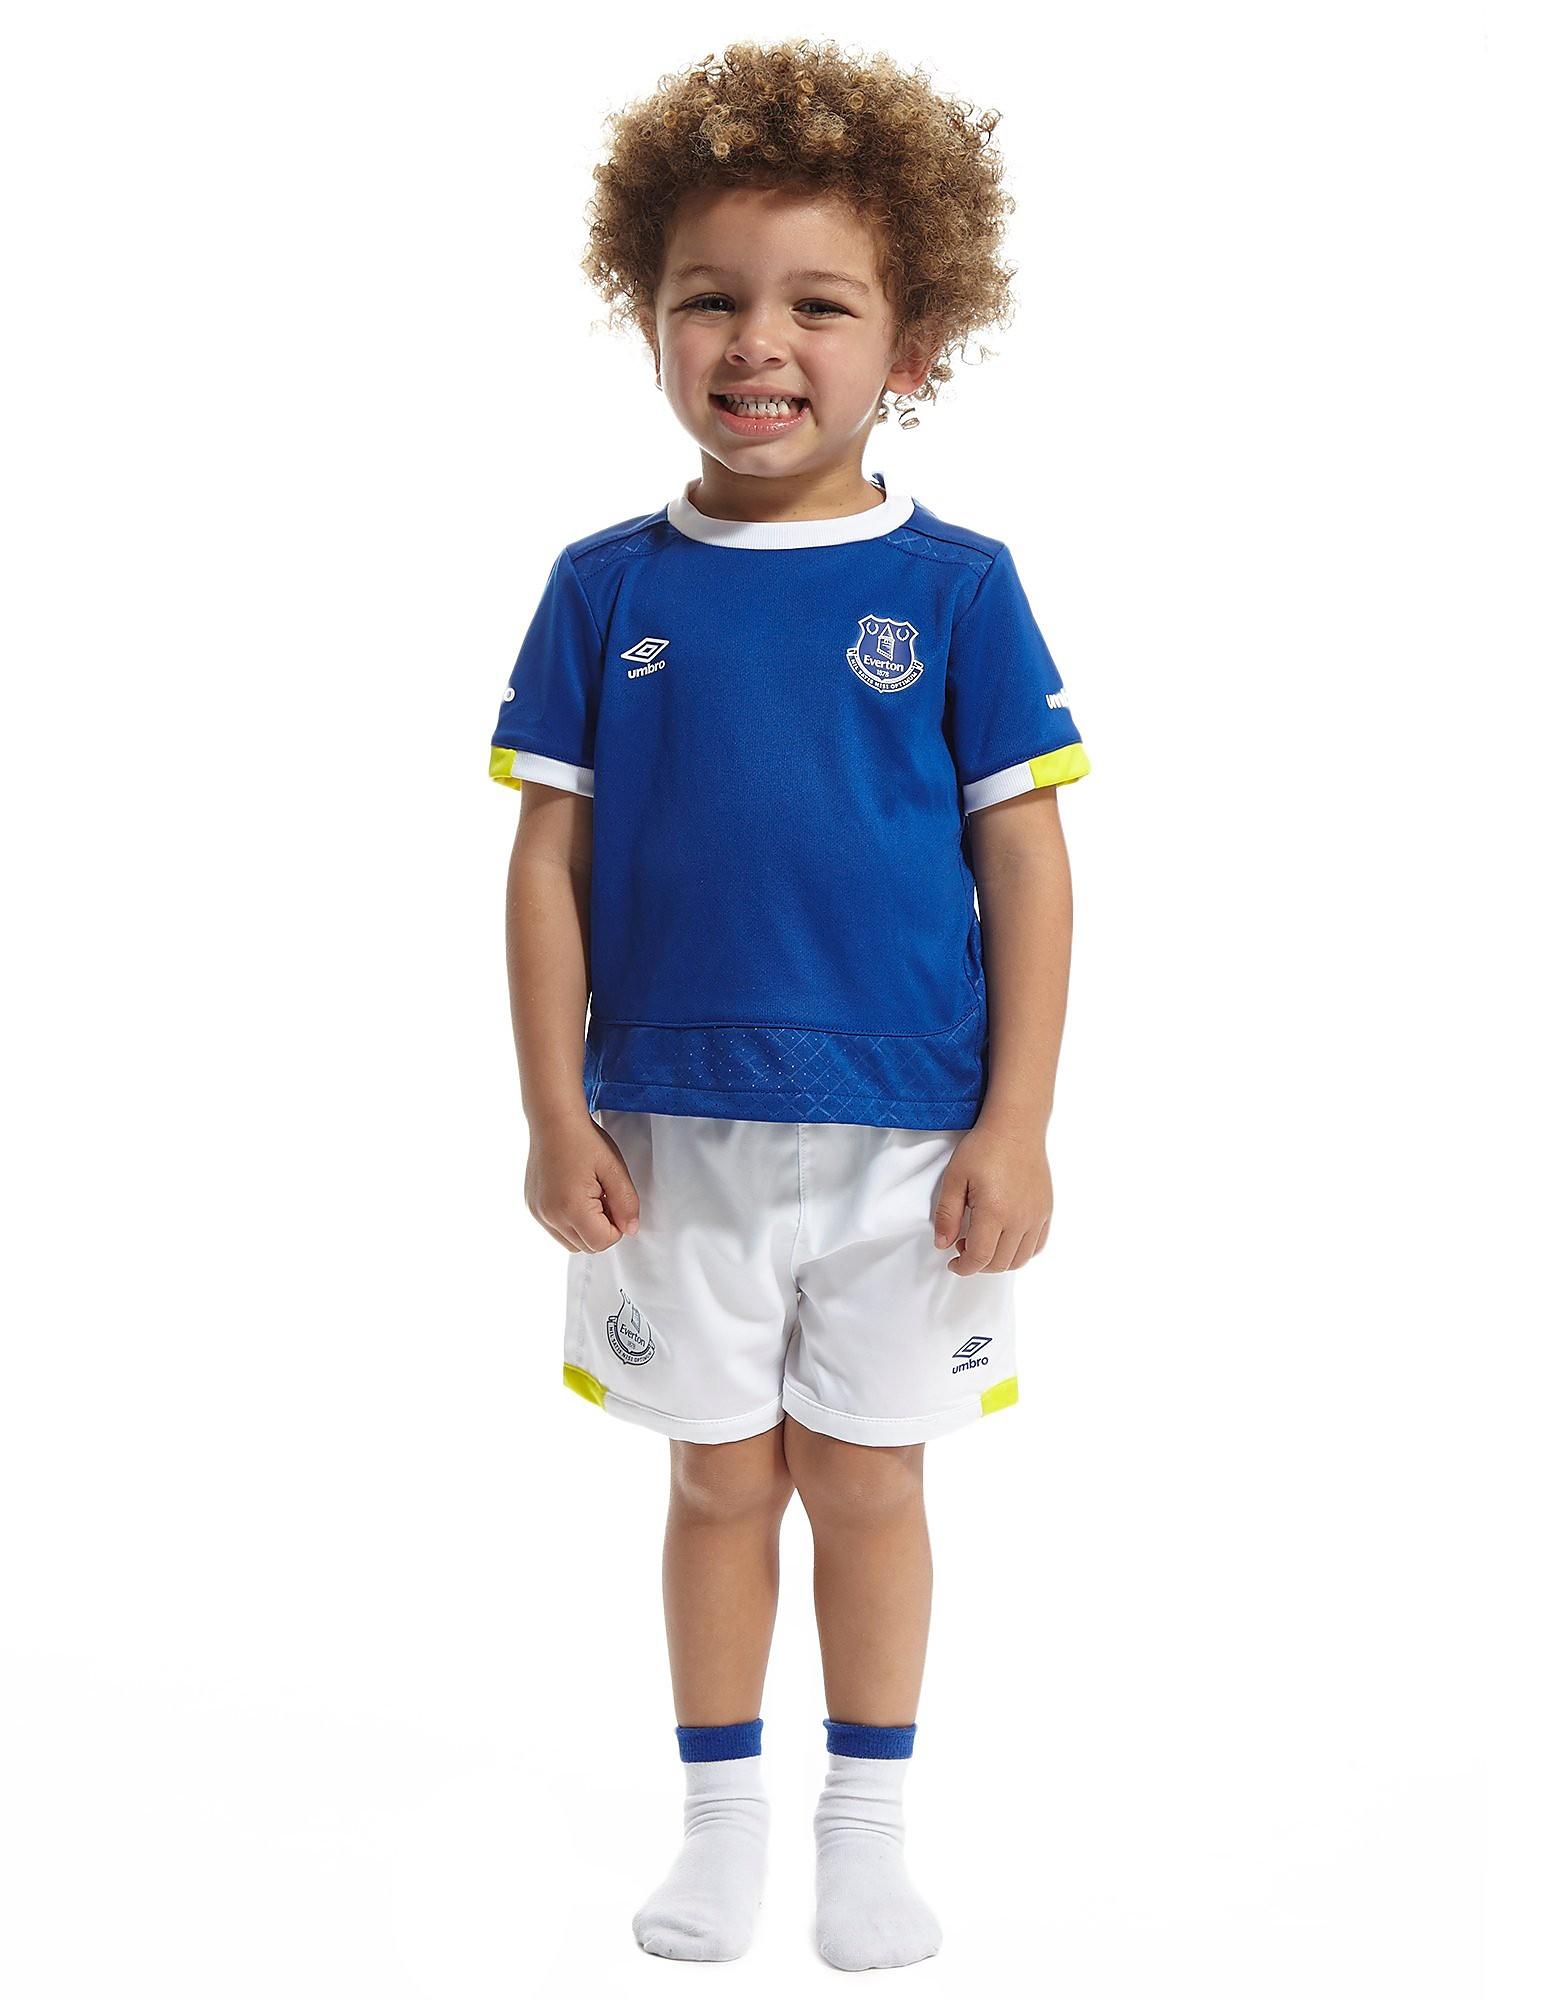 Umbro Everton FC 2016/17 Home Kit Infant